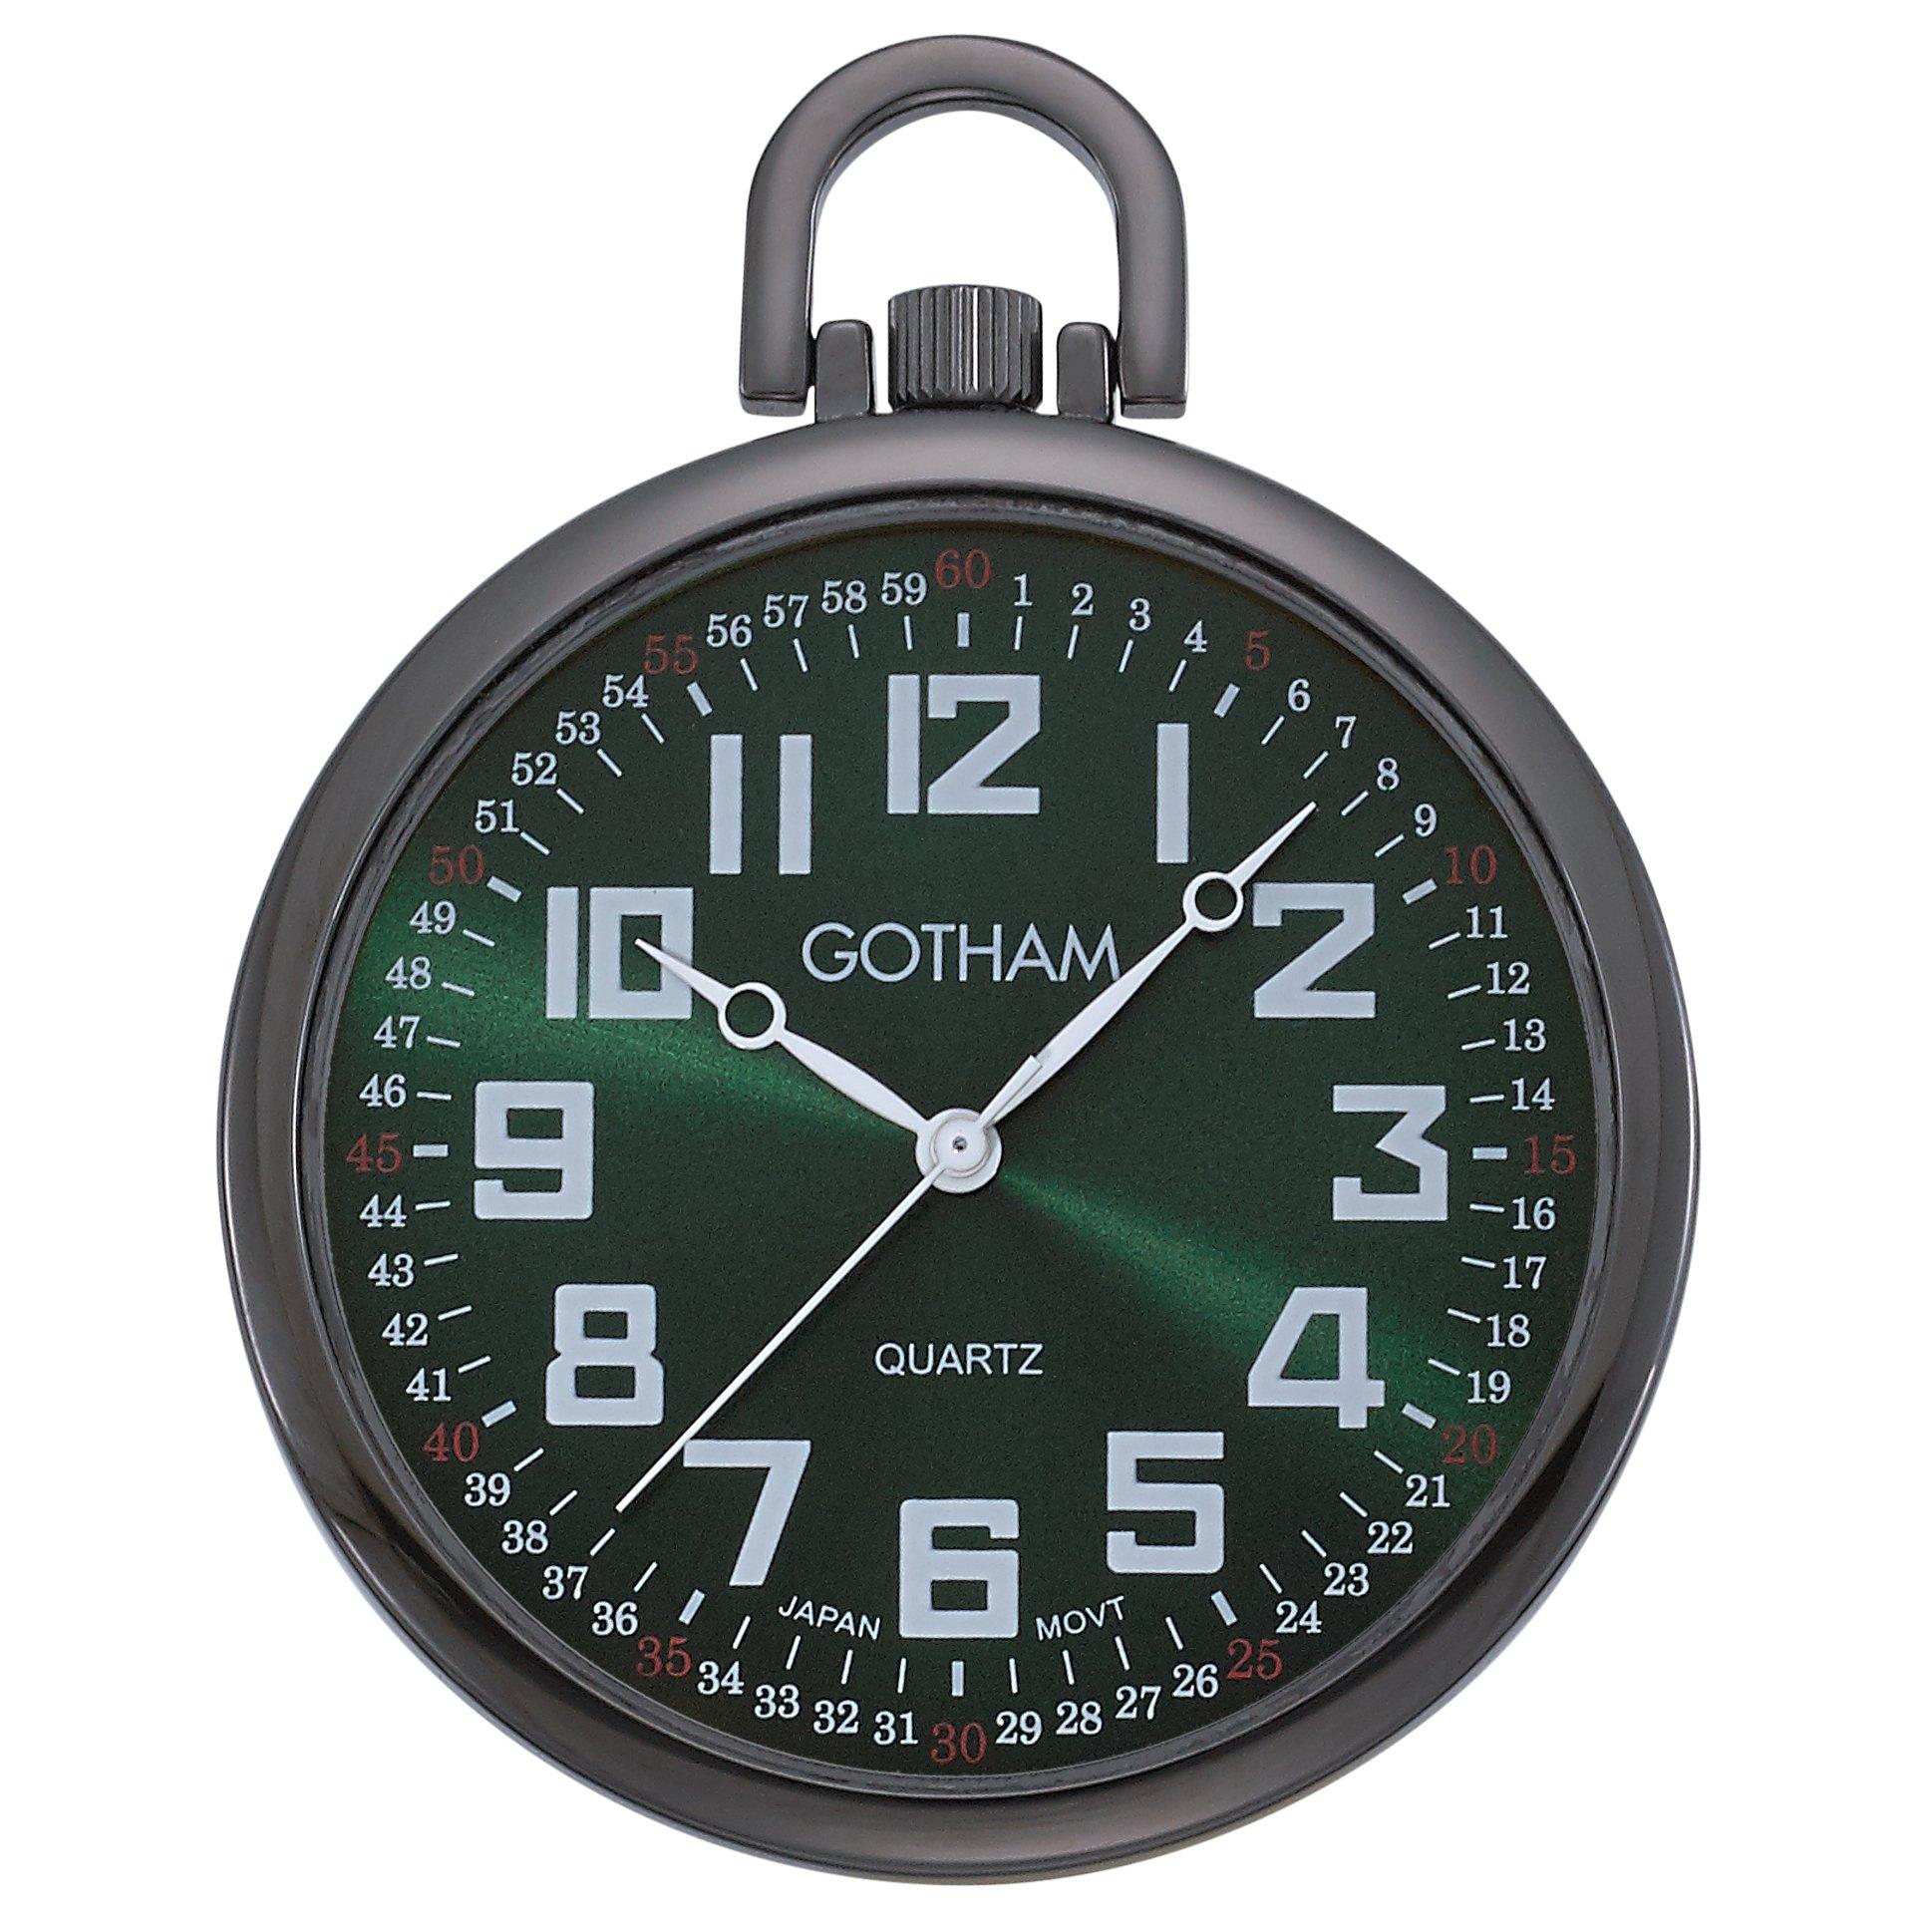 Gotham Men's Gun-Tone Slim Railroad 24 Hour Open Face Quartz Pocket Watch # GWC15027BG by Gotham (Image #1)